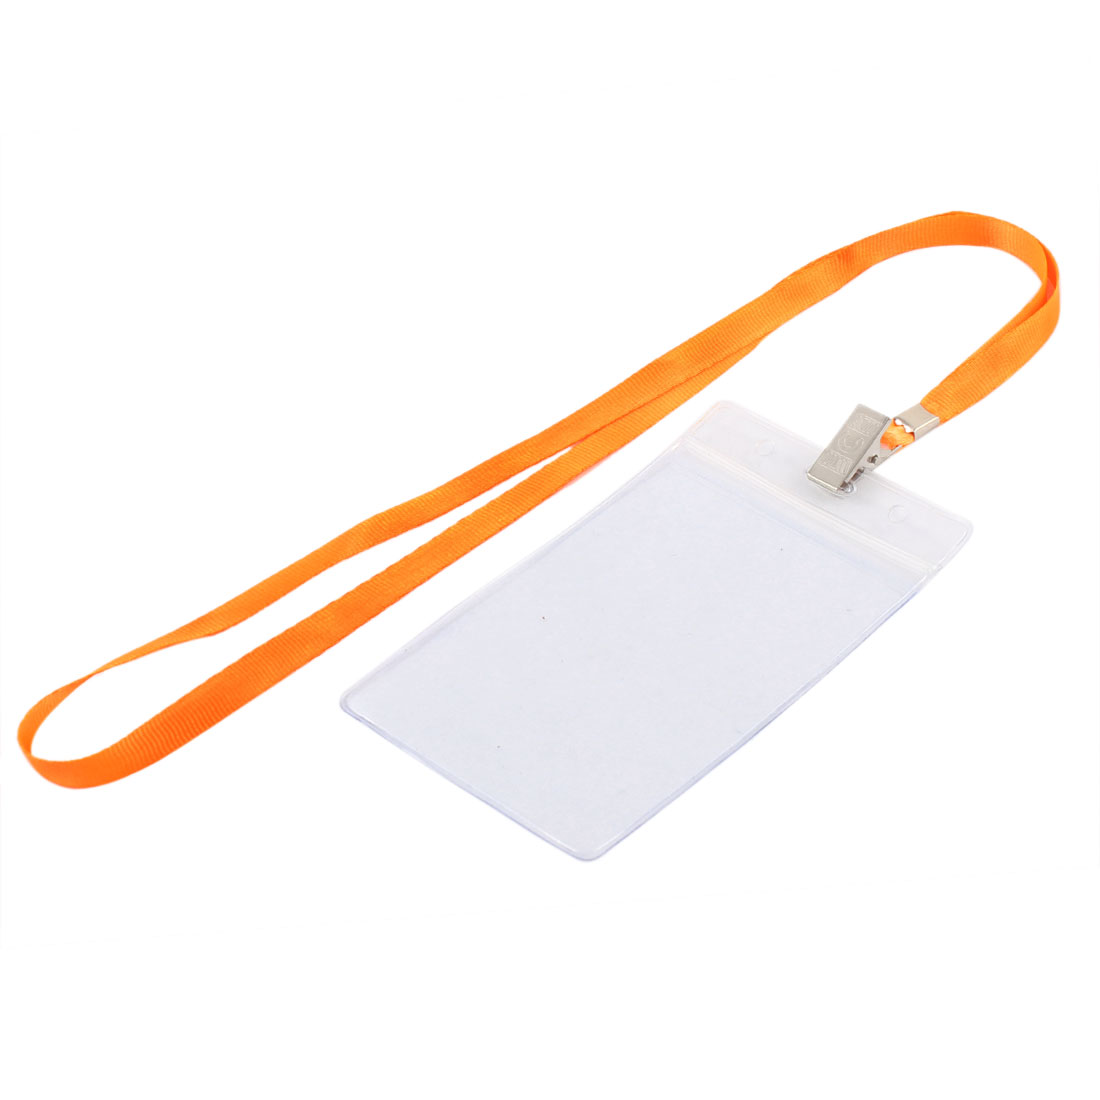 Neck Strap Plastic Vertical ID Name Business Badge Card Holder Orange Clear